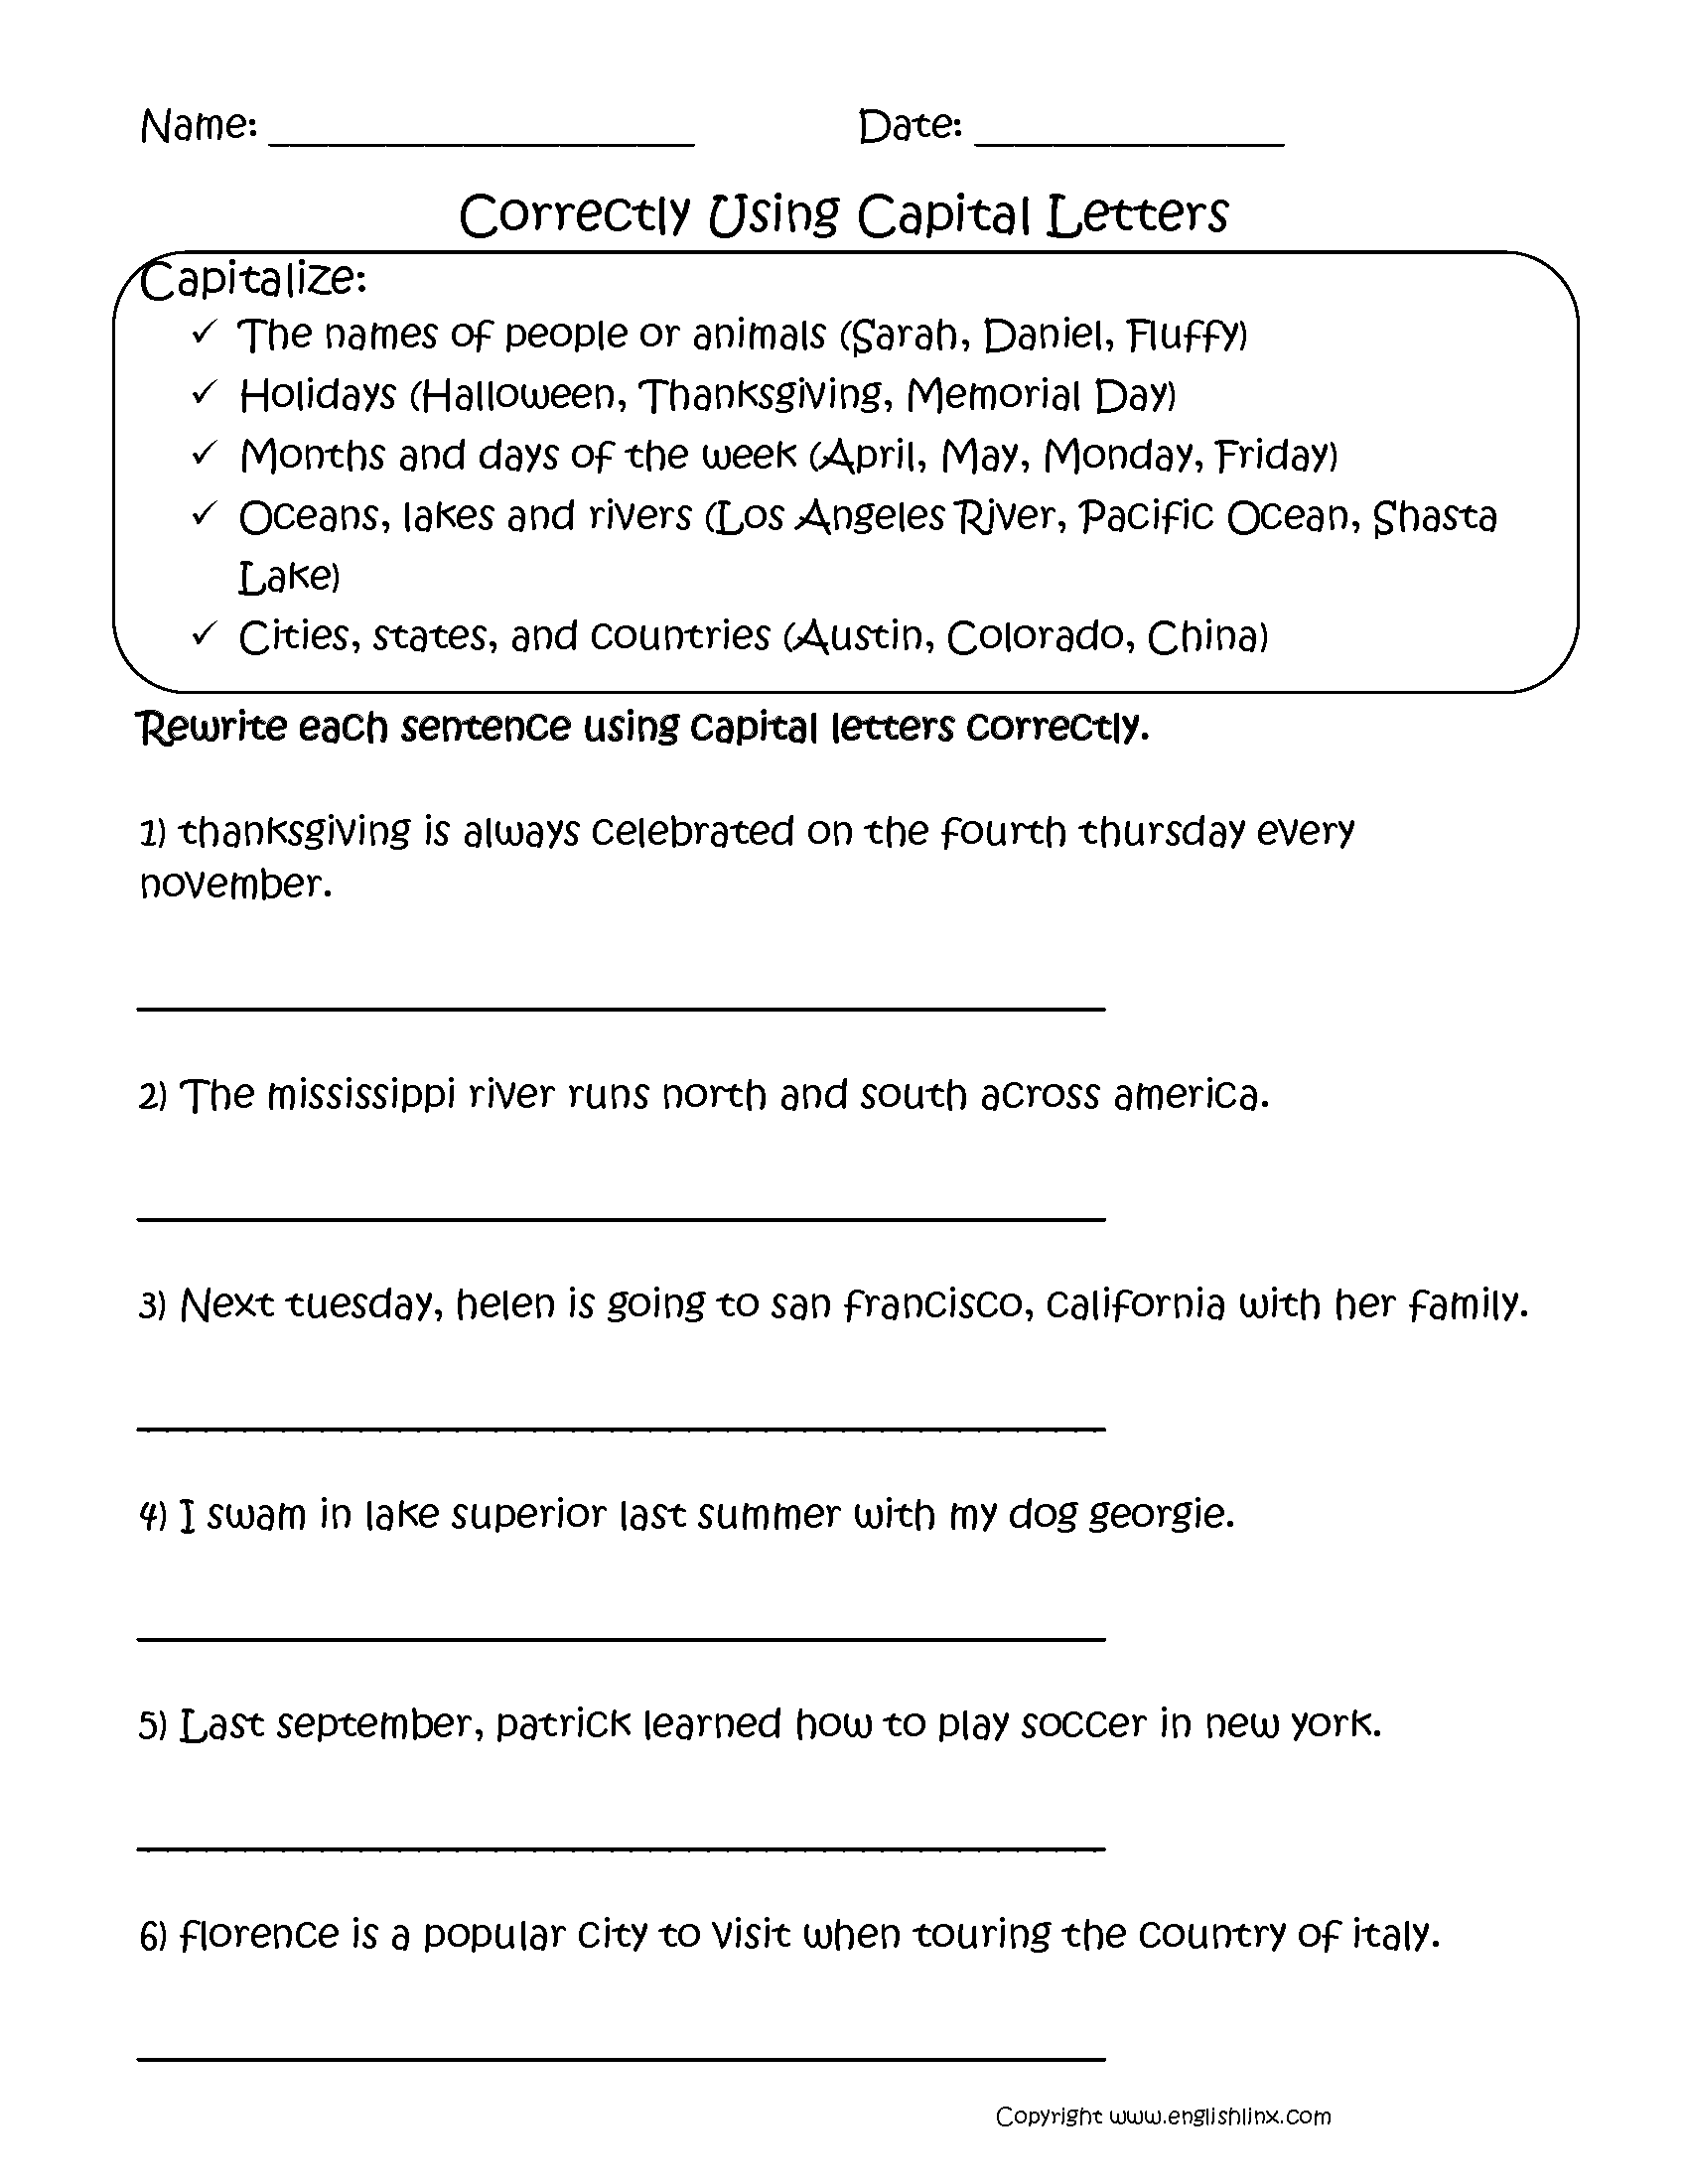 Capitalization Worksheets 2nd Grade The Best Worksheets Image